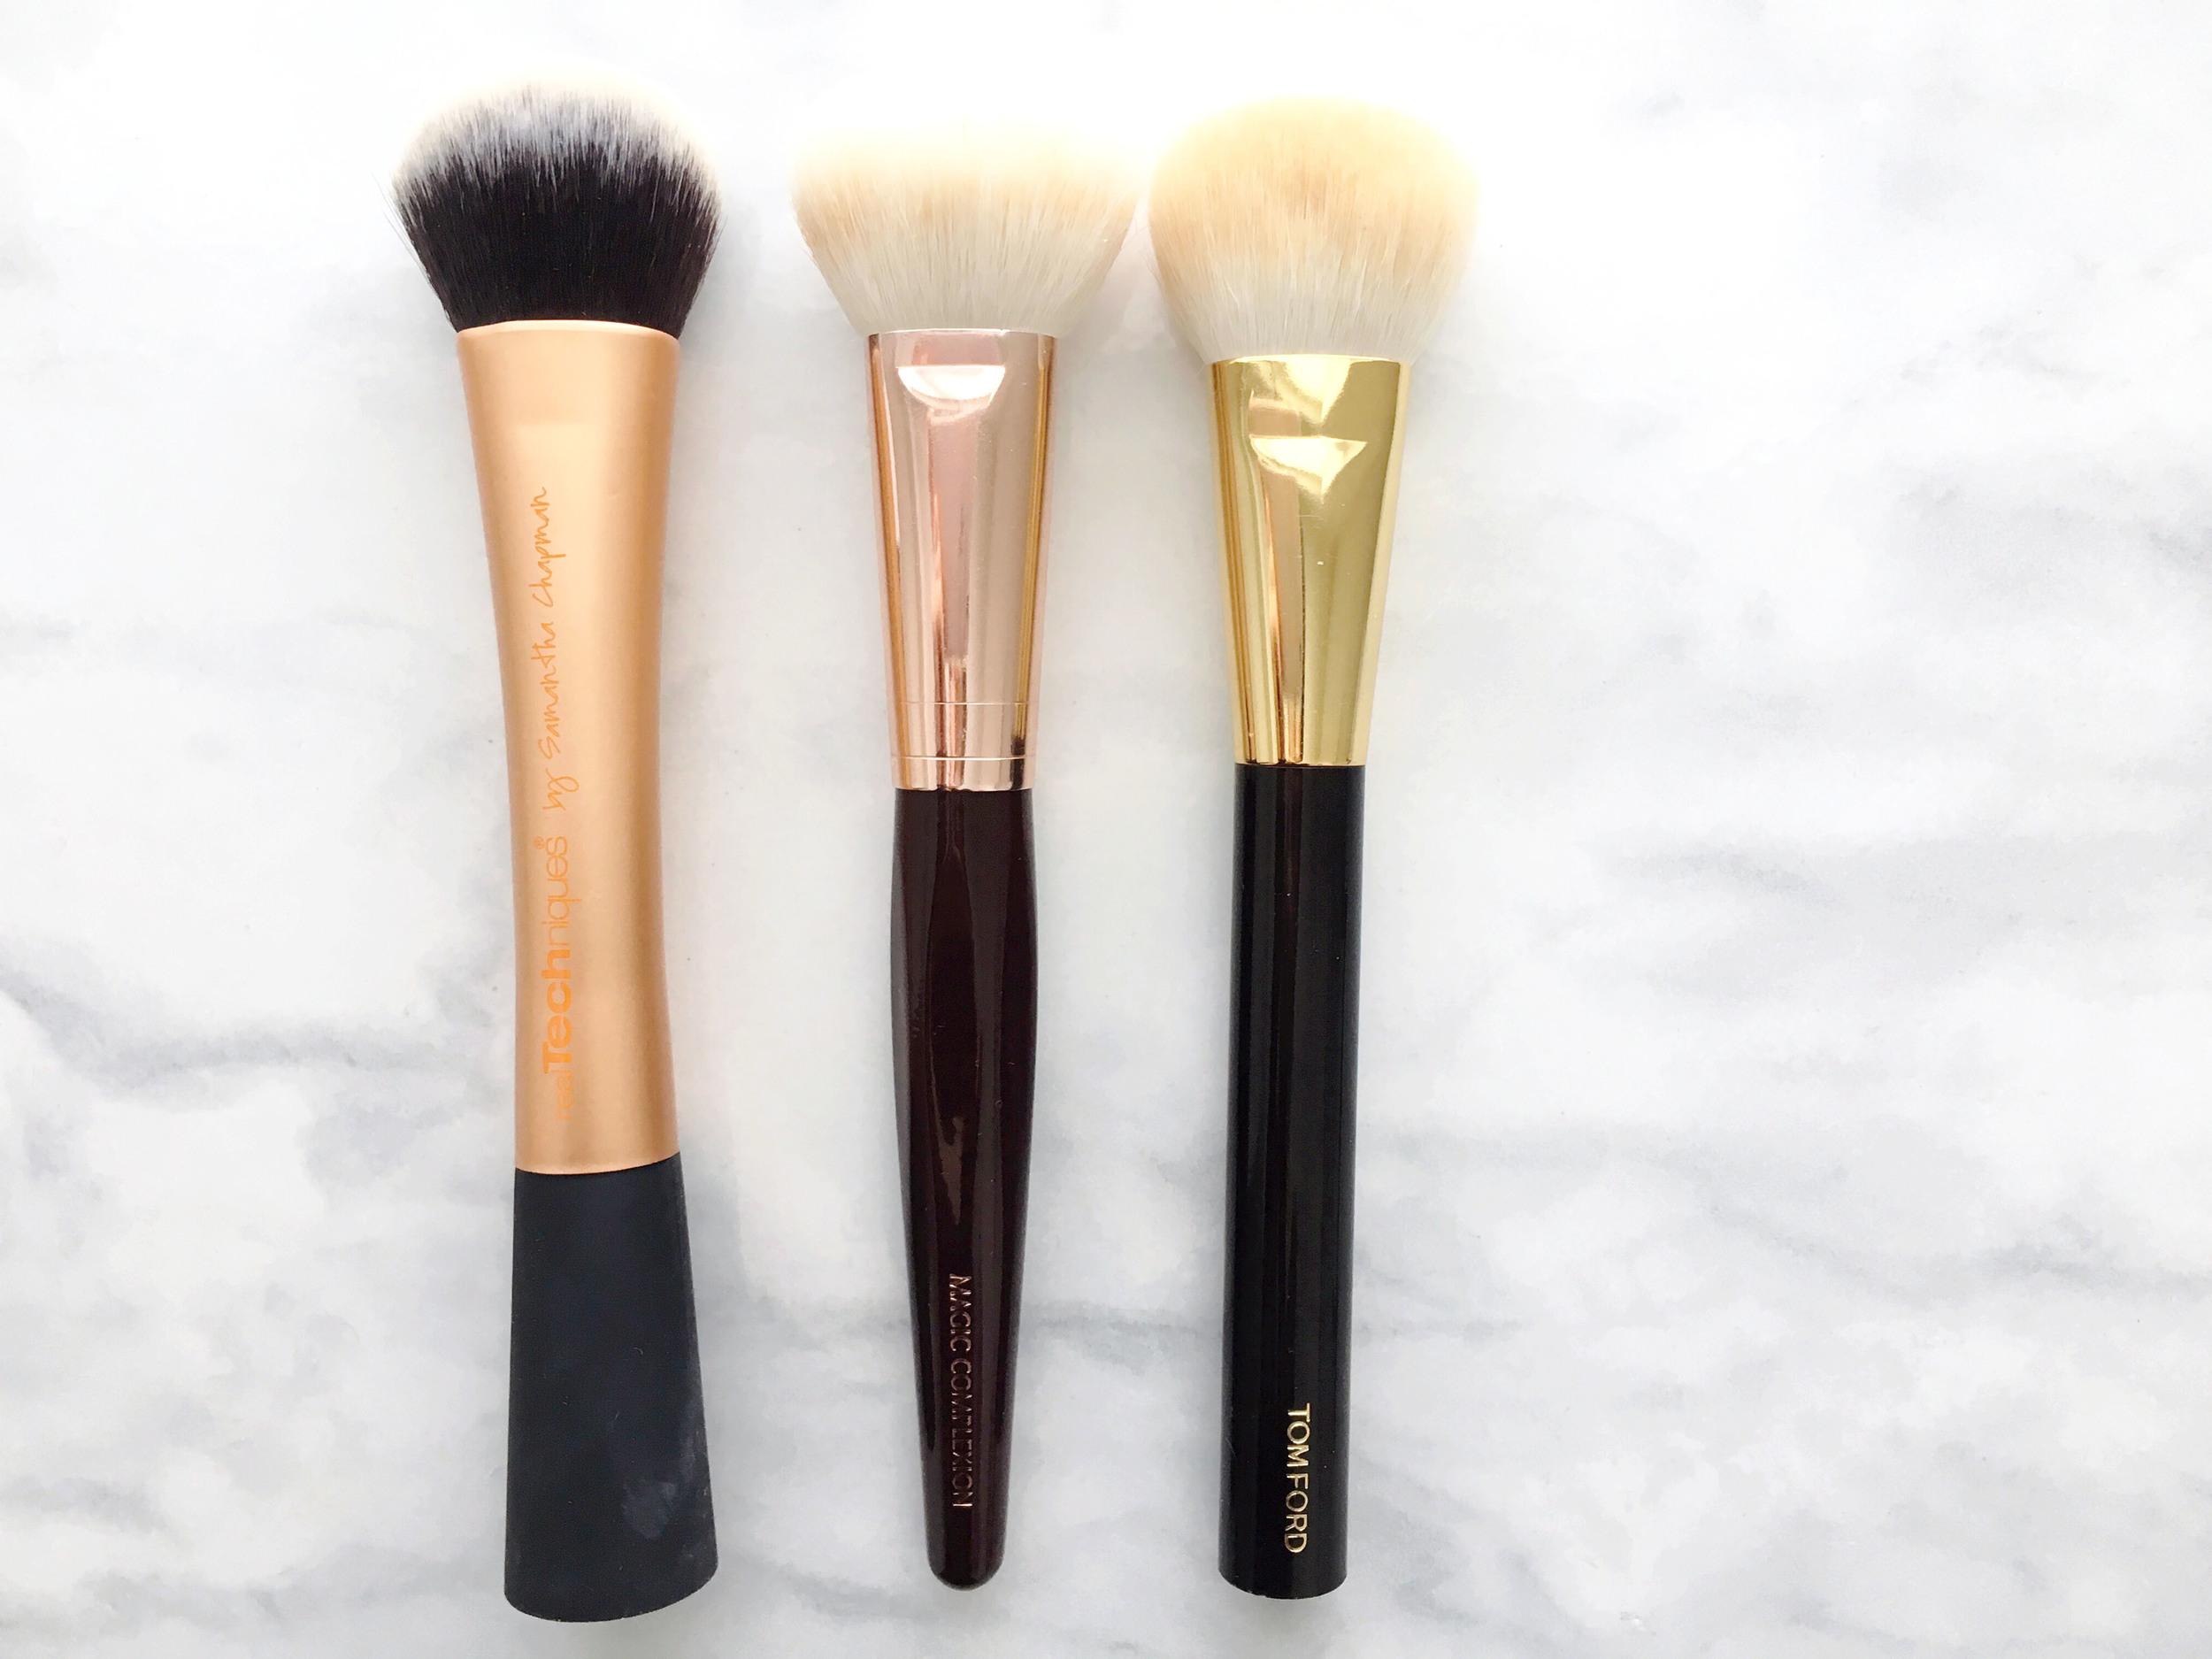 Real Techniques Expert Face Brush, Charlotte Tilbury Magic Foundation Brush, Tom Ford Cream Foundation Brush